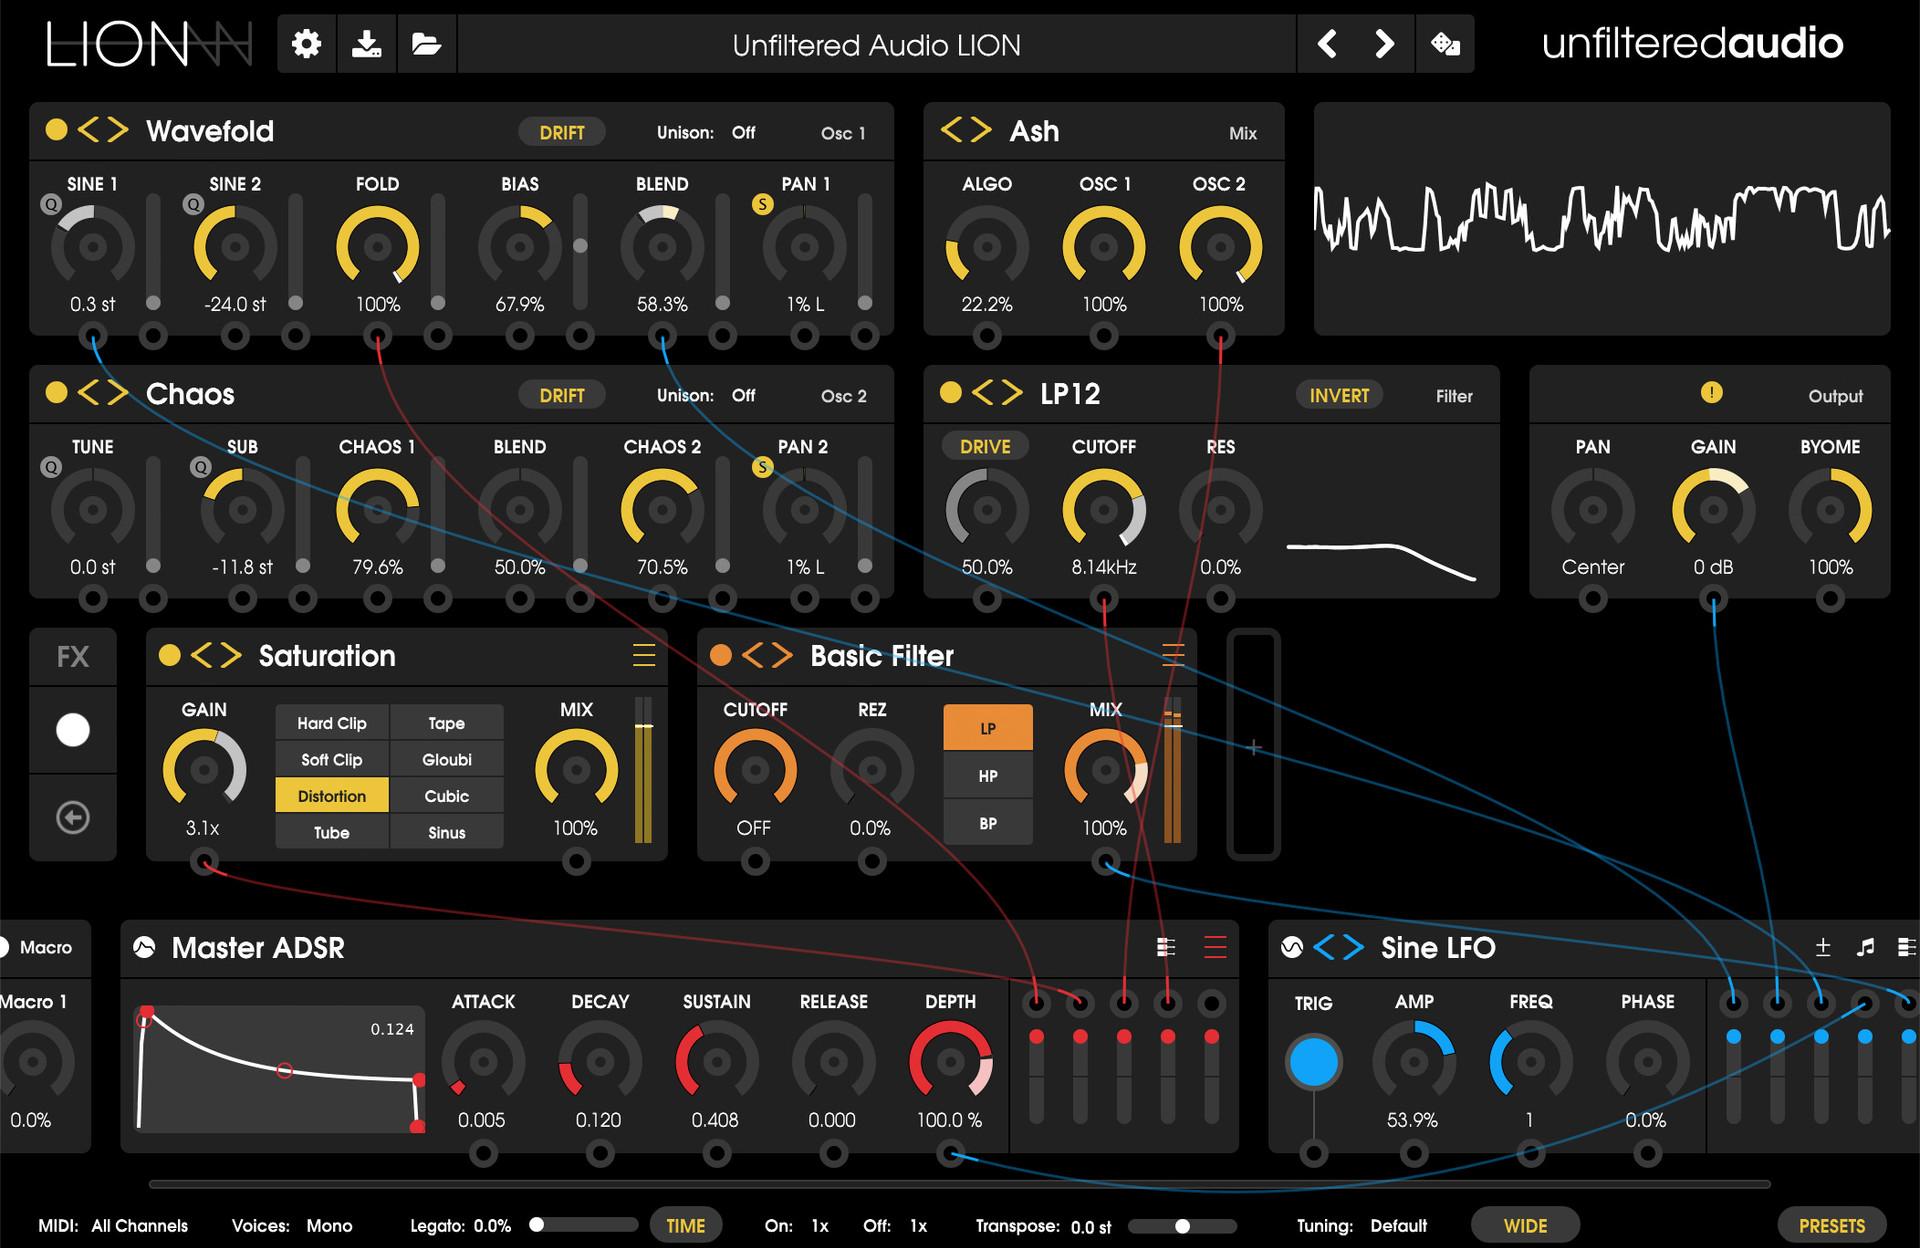 Unfiltered Audio - Lion